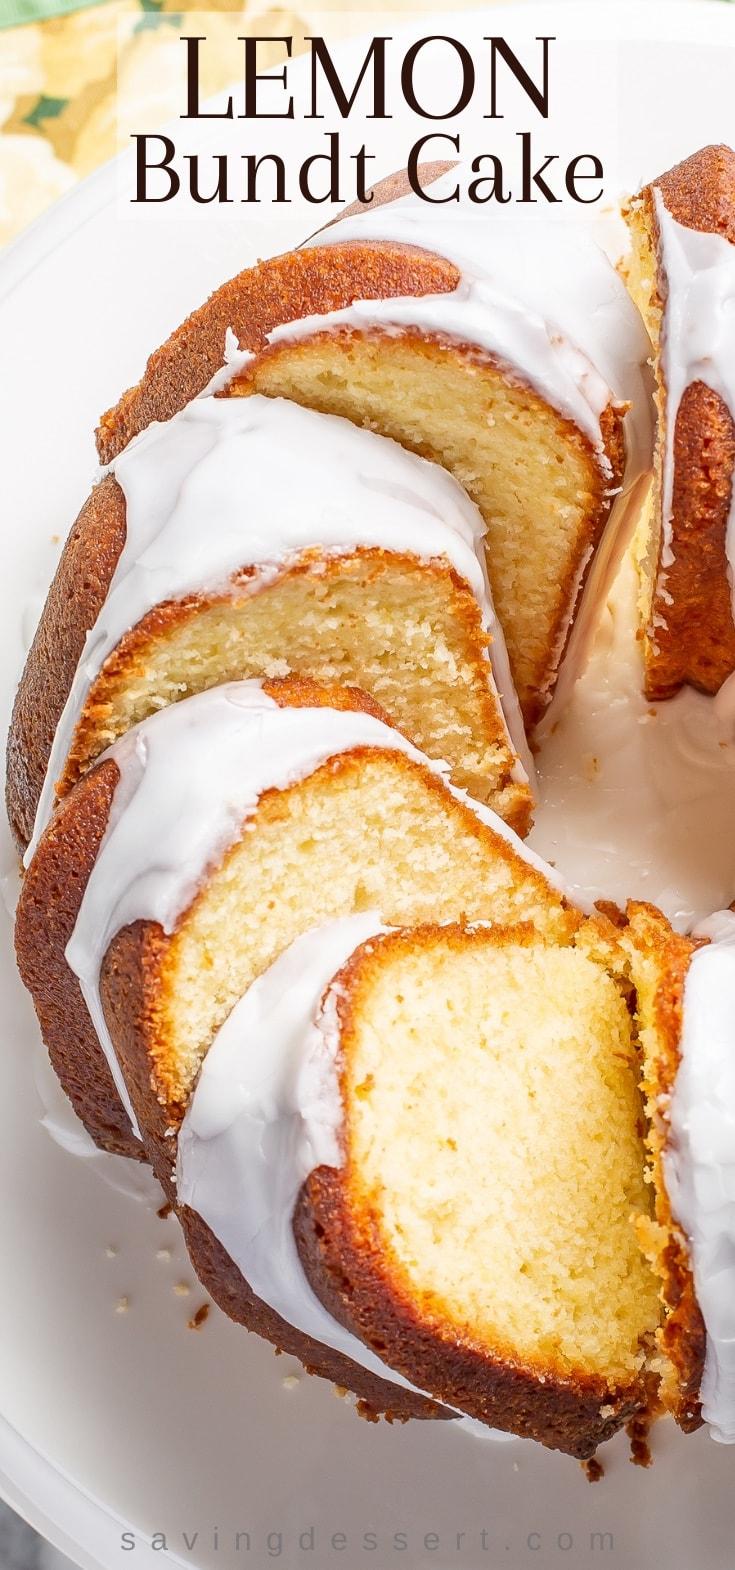 Sliced and iced Lemon Bundt Cake on a platter